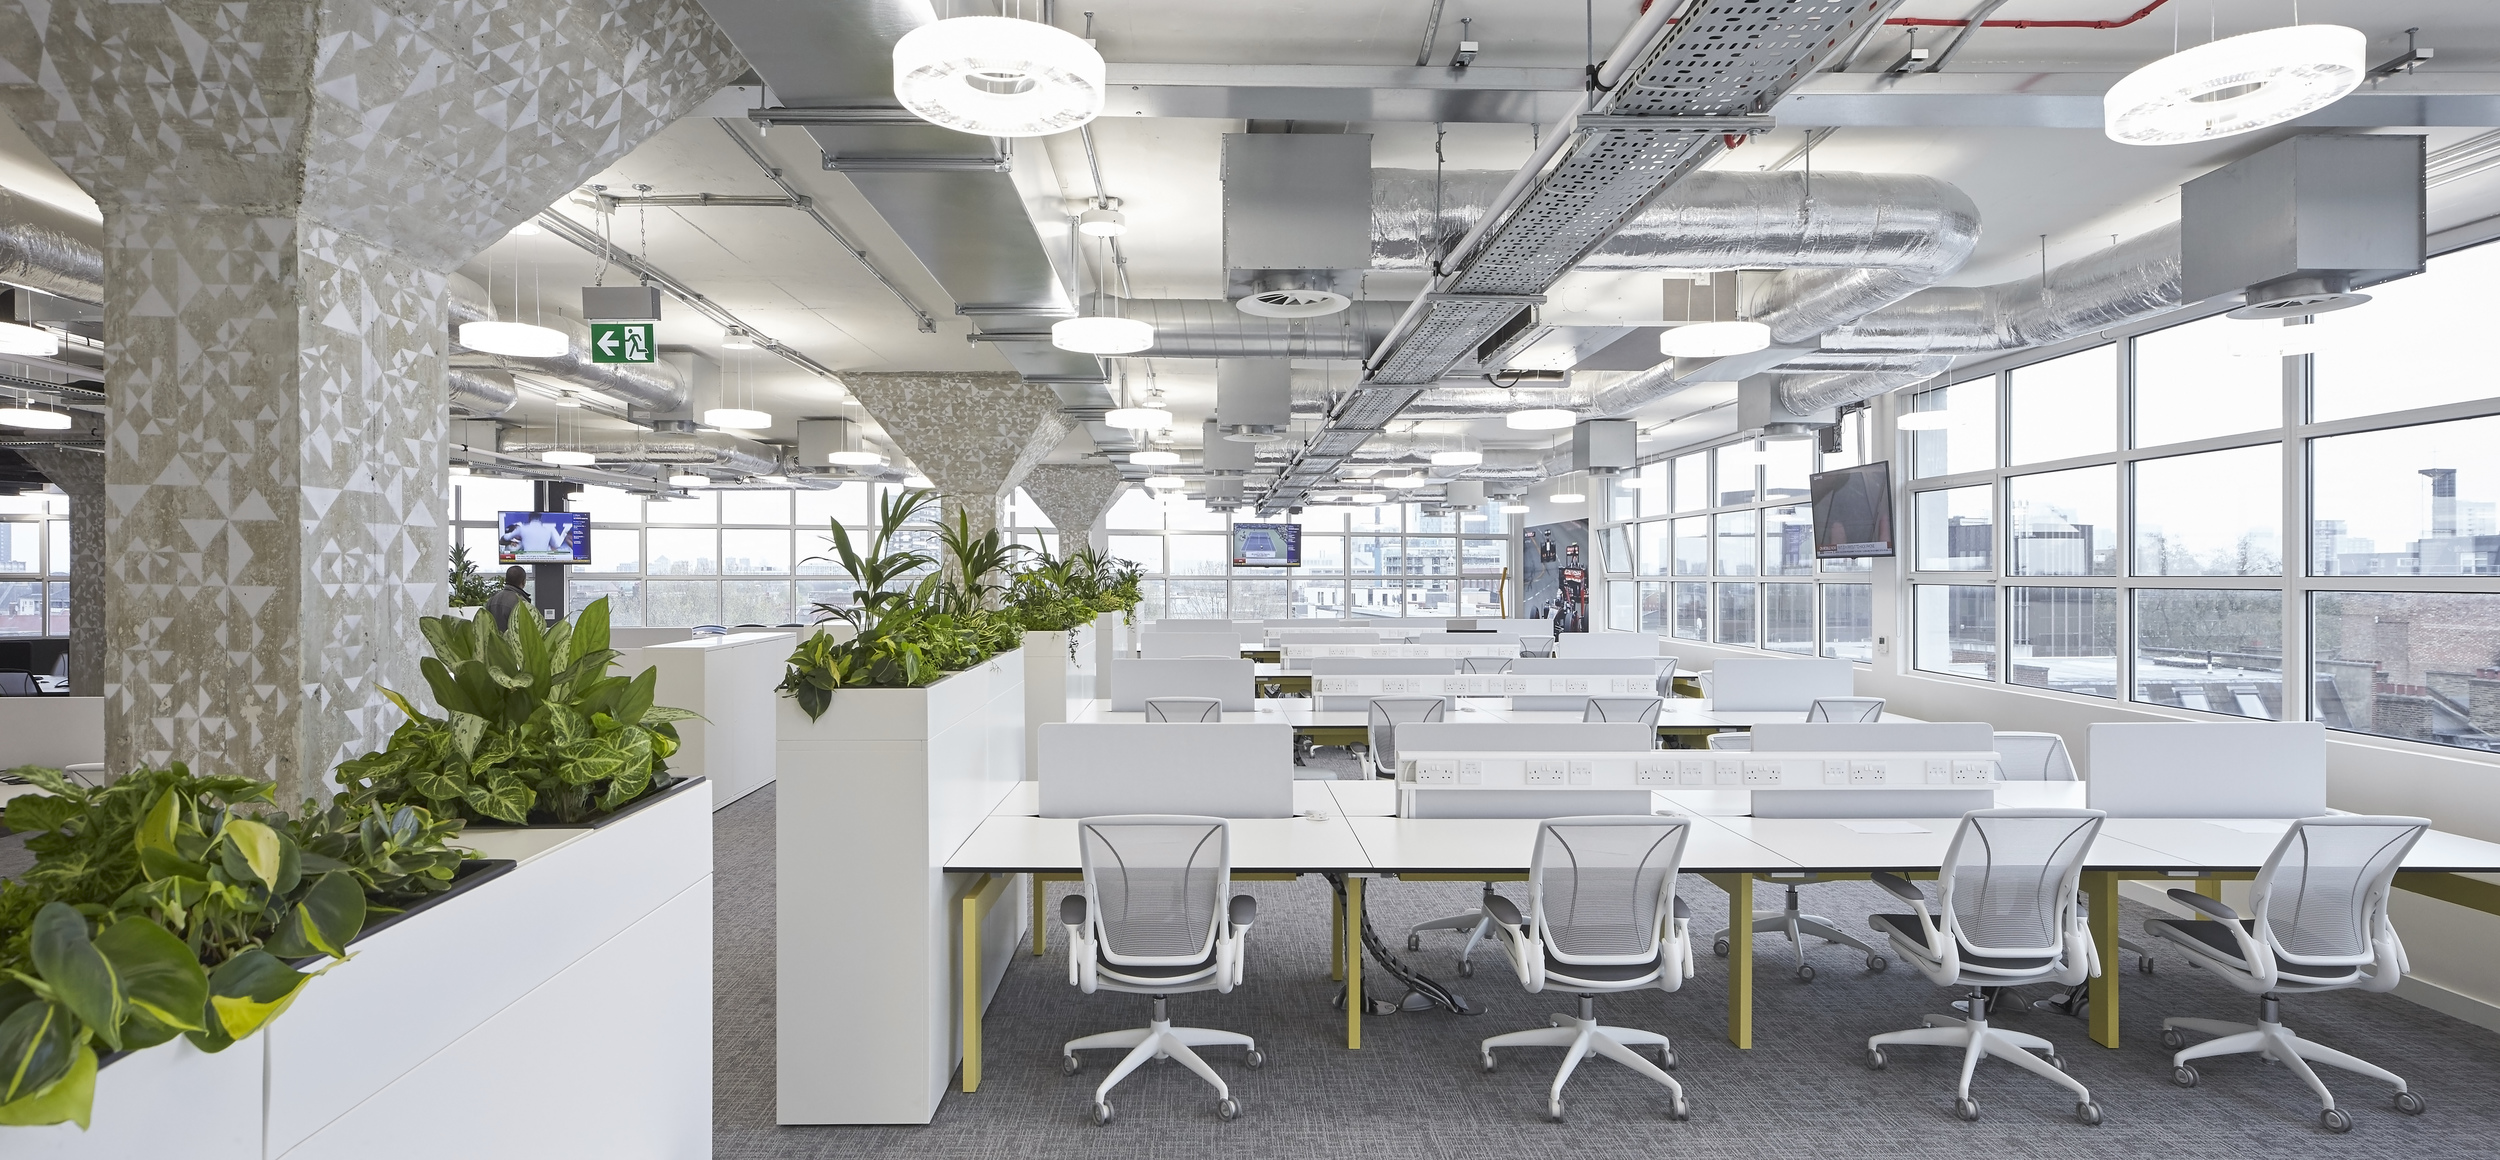 HLW_SKY offices_Brick Lane_-®Hufton+Crow_008.jpg